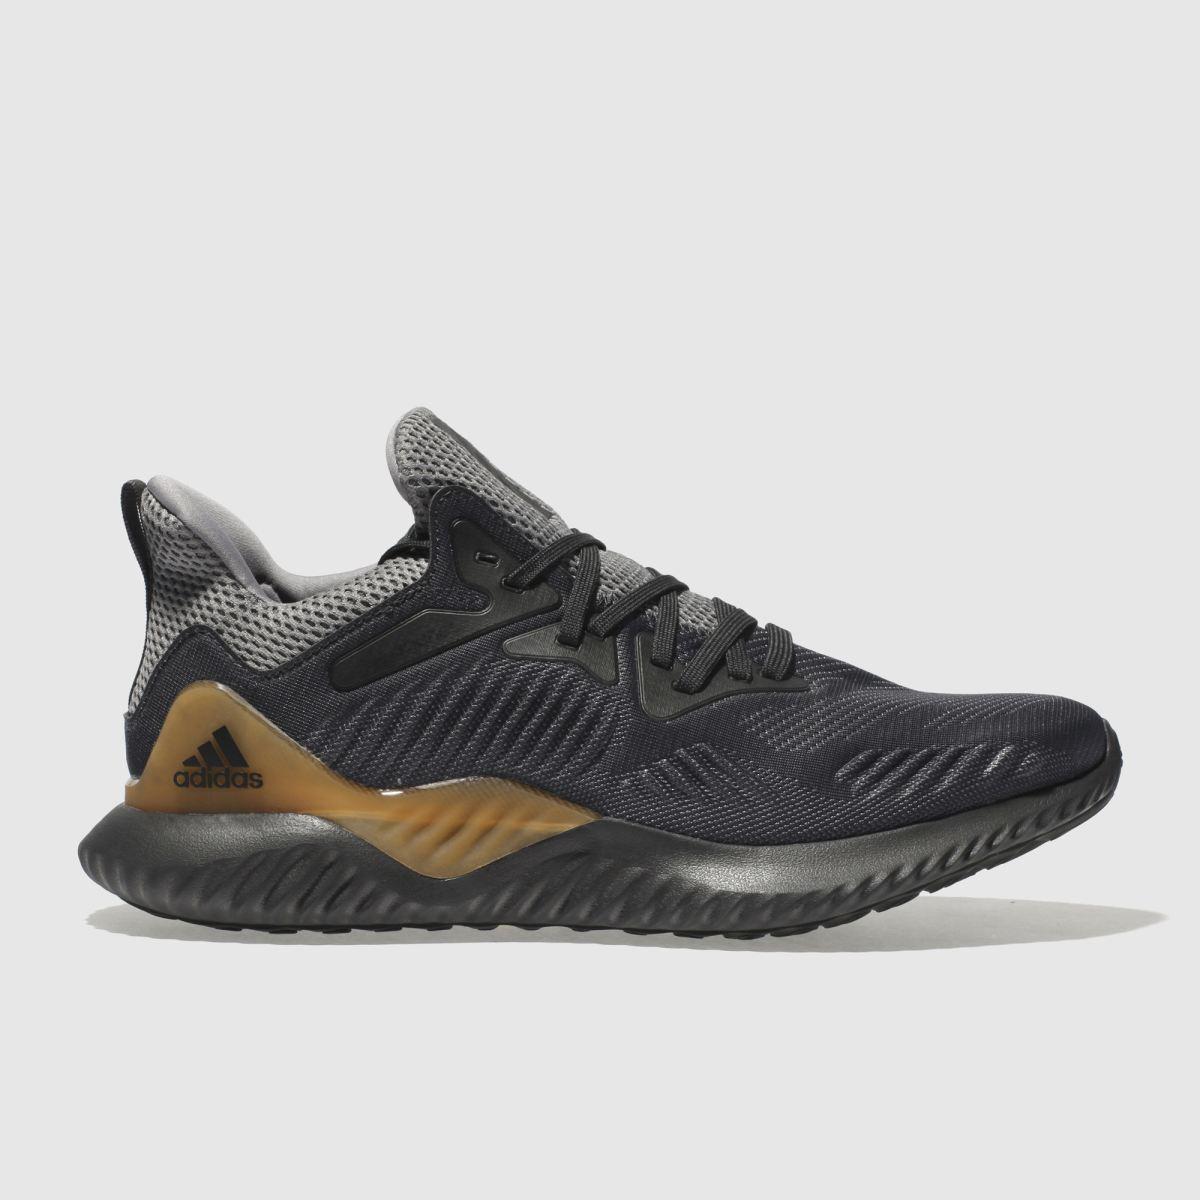 Adidas Dark Grey Alphabounce Trainers